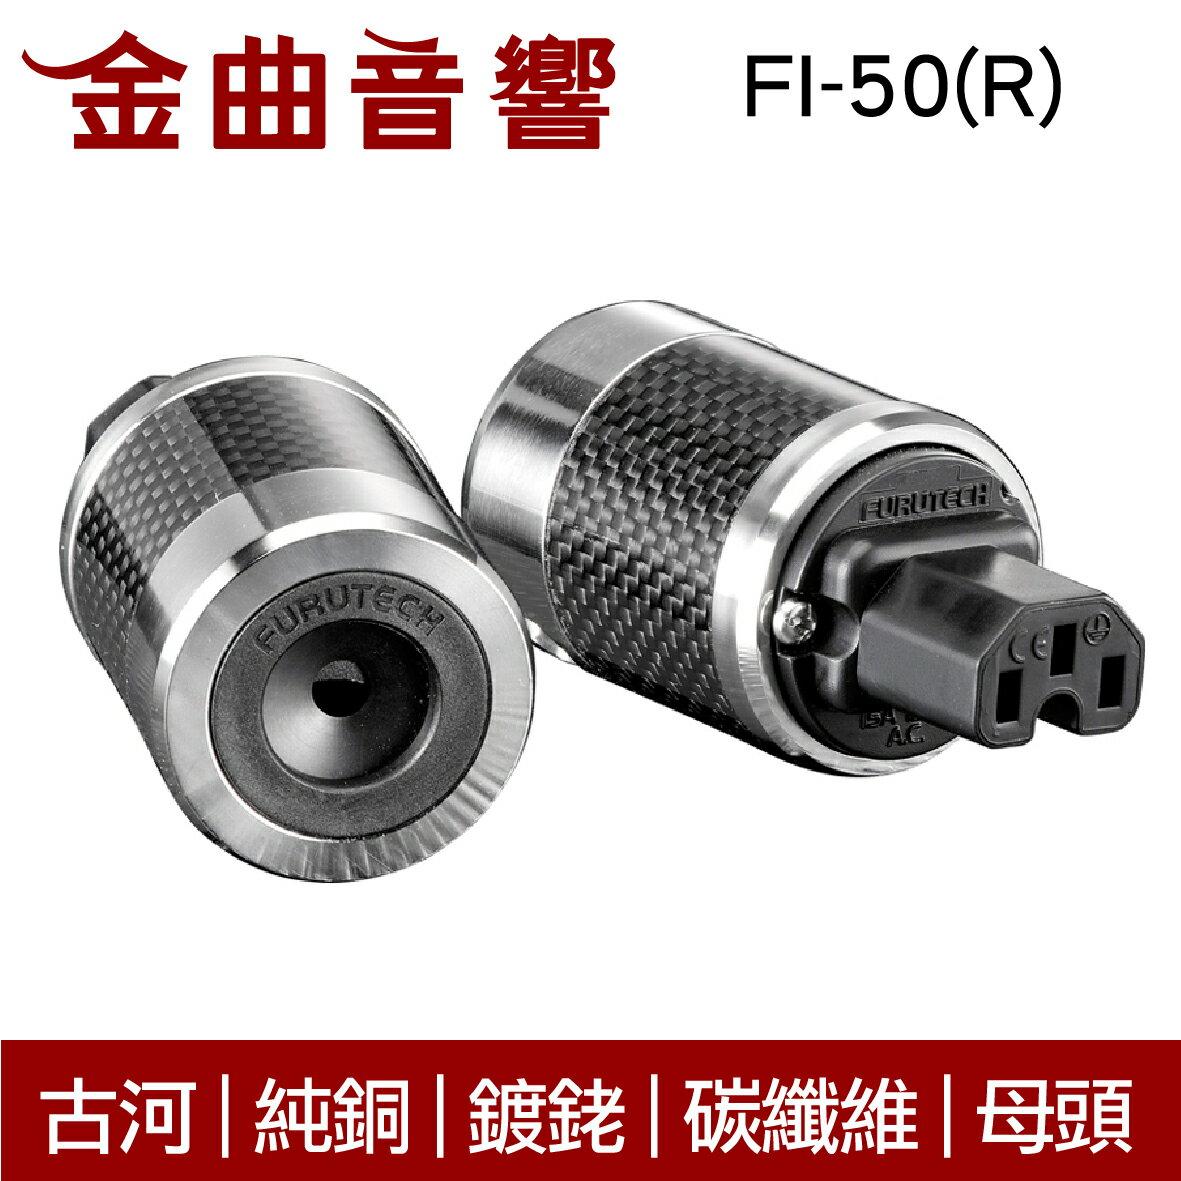 FURUTECH 古河 FI-50(R) 純銅 鍍銠 碳纖維 母頭 電源插頭 | 金曲音響